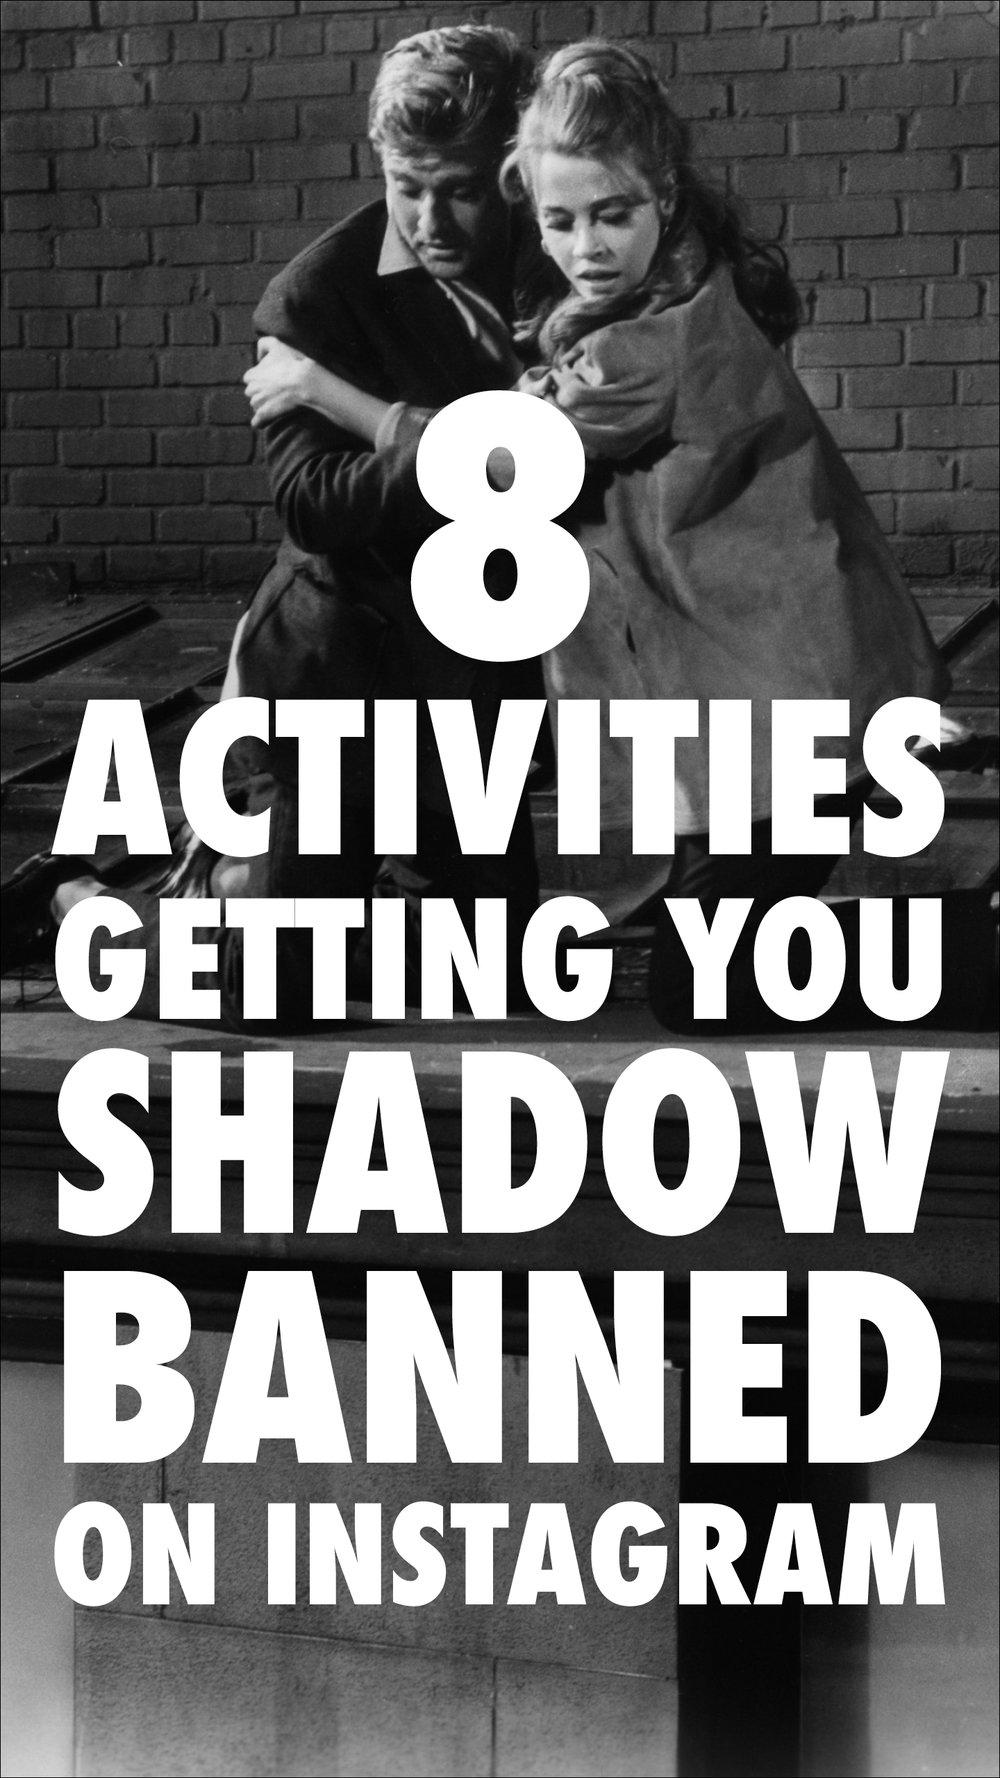 Shadowban Insta Story.jpg